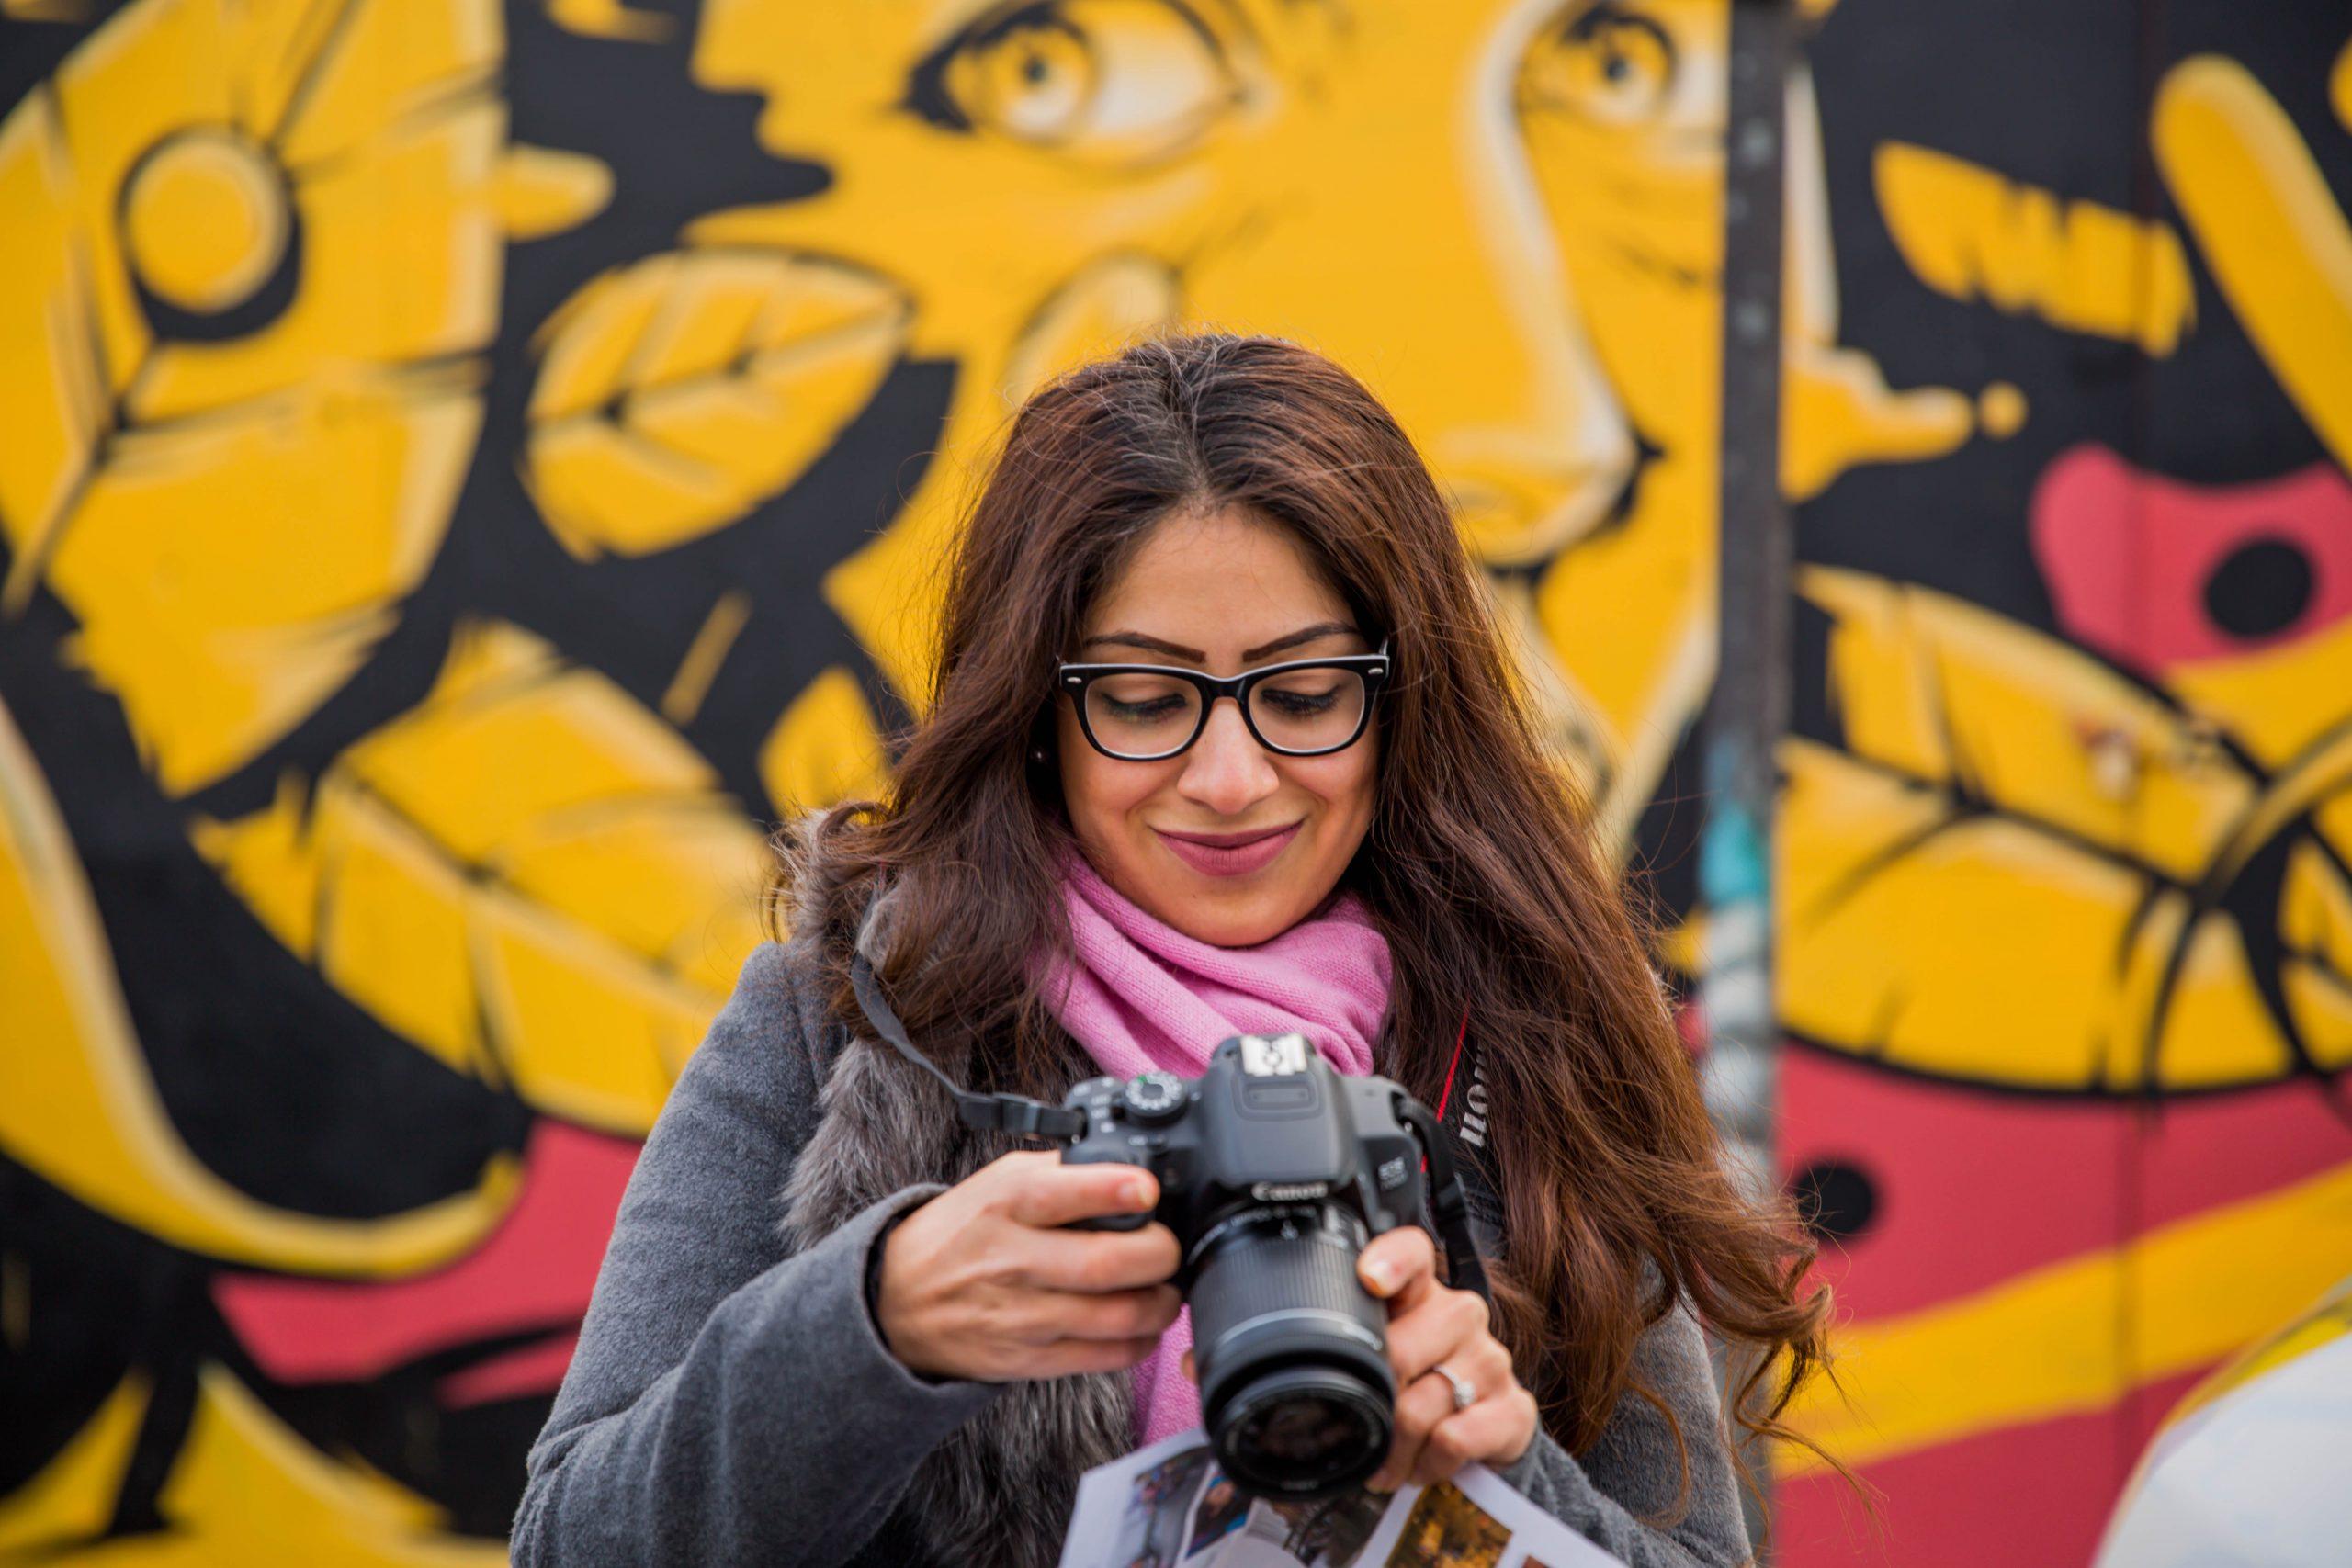 Women and camera